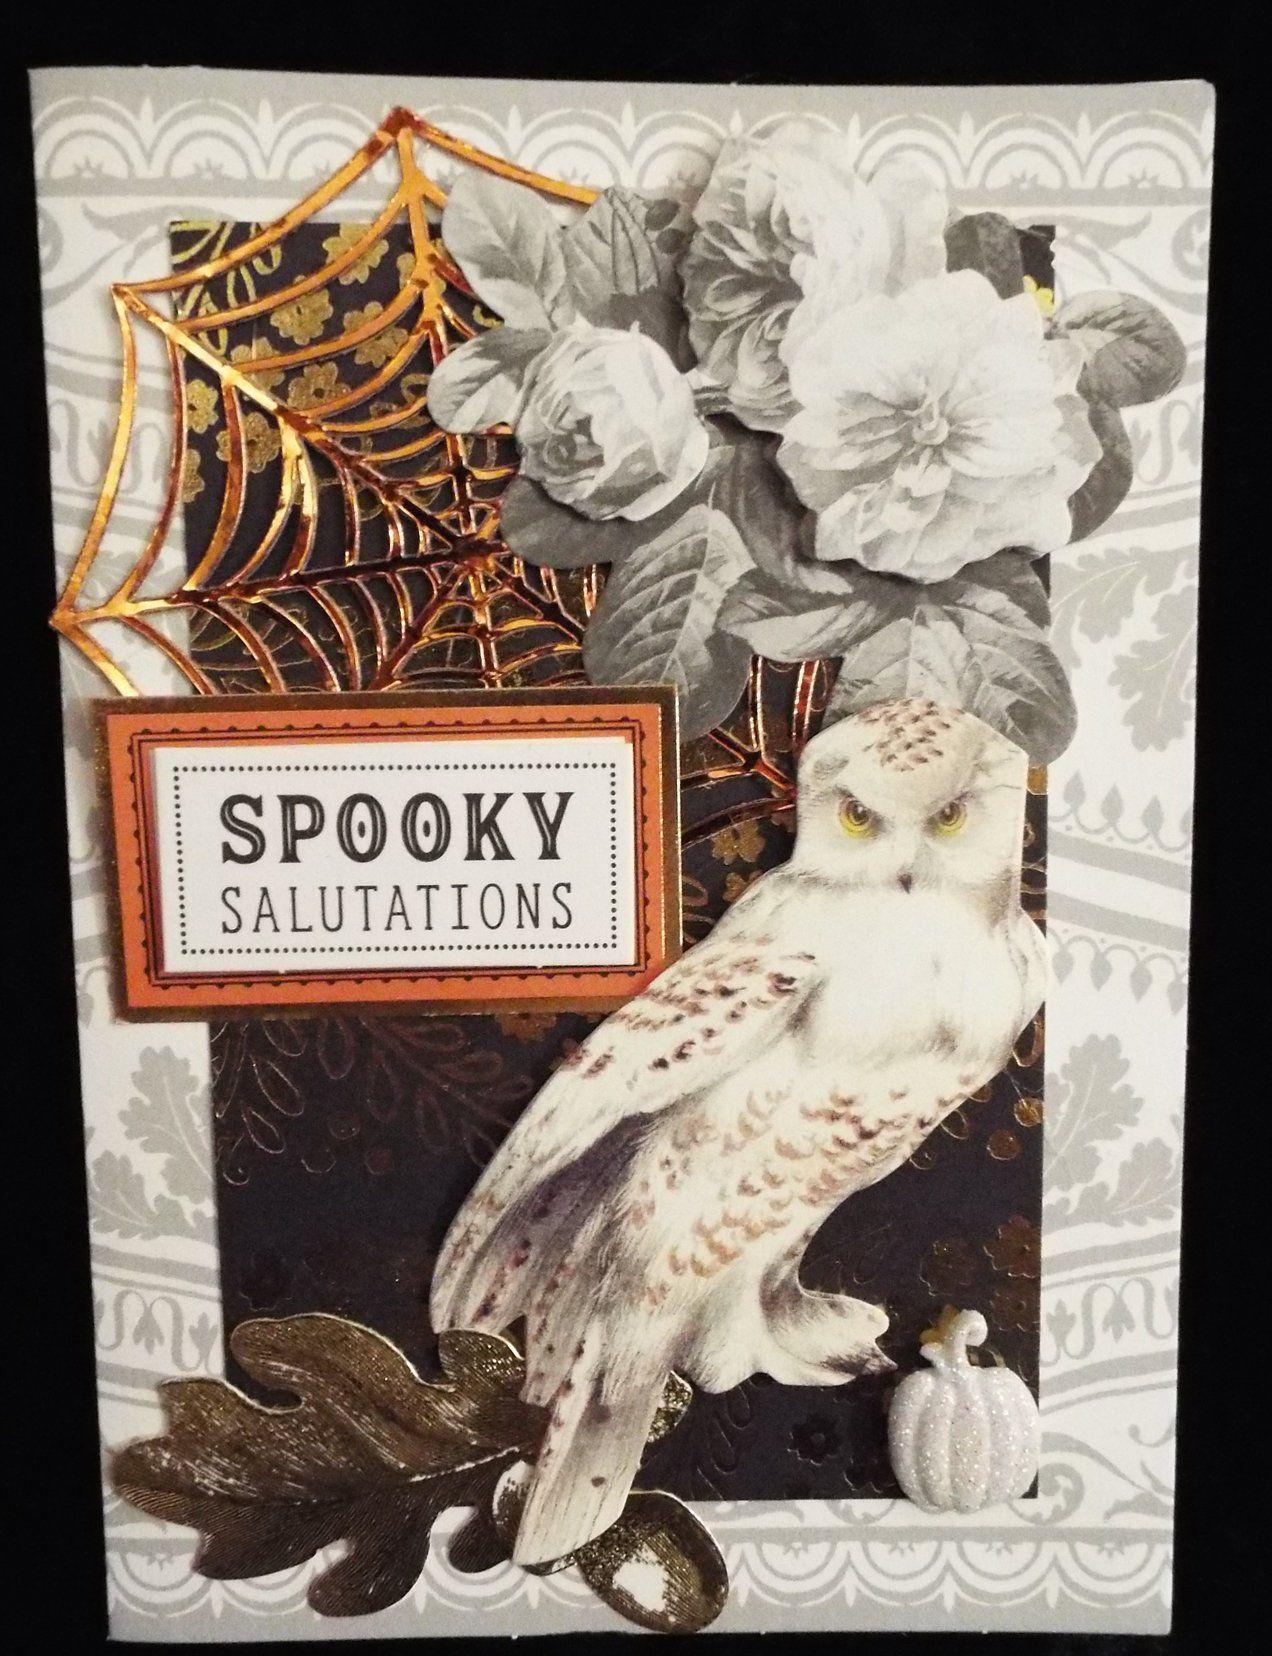 owl spooky salutations halloween card | halloween | pinterest